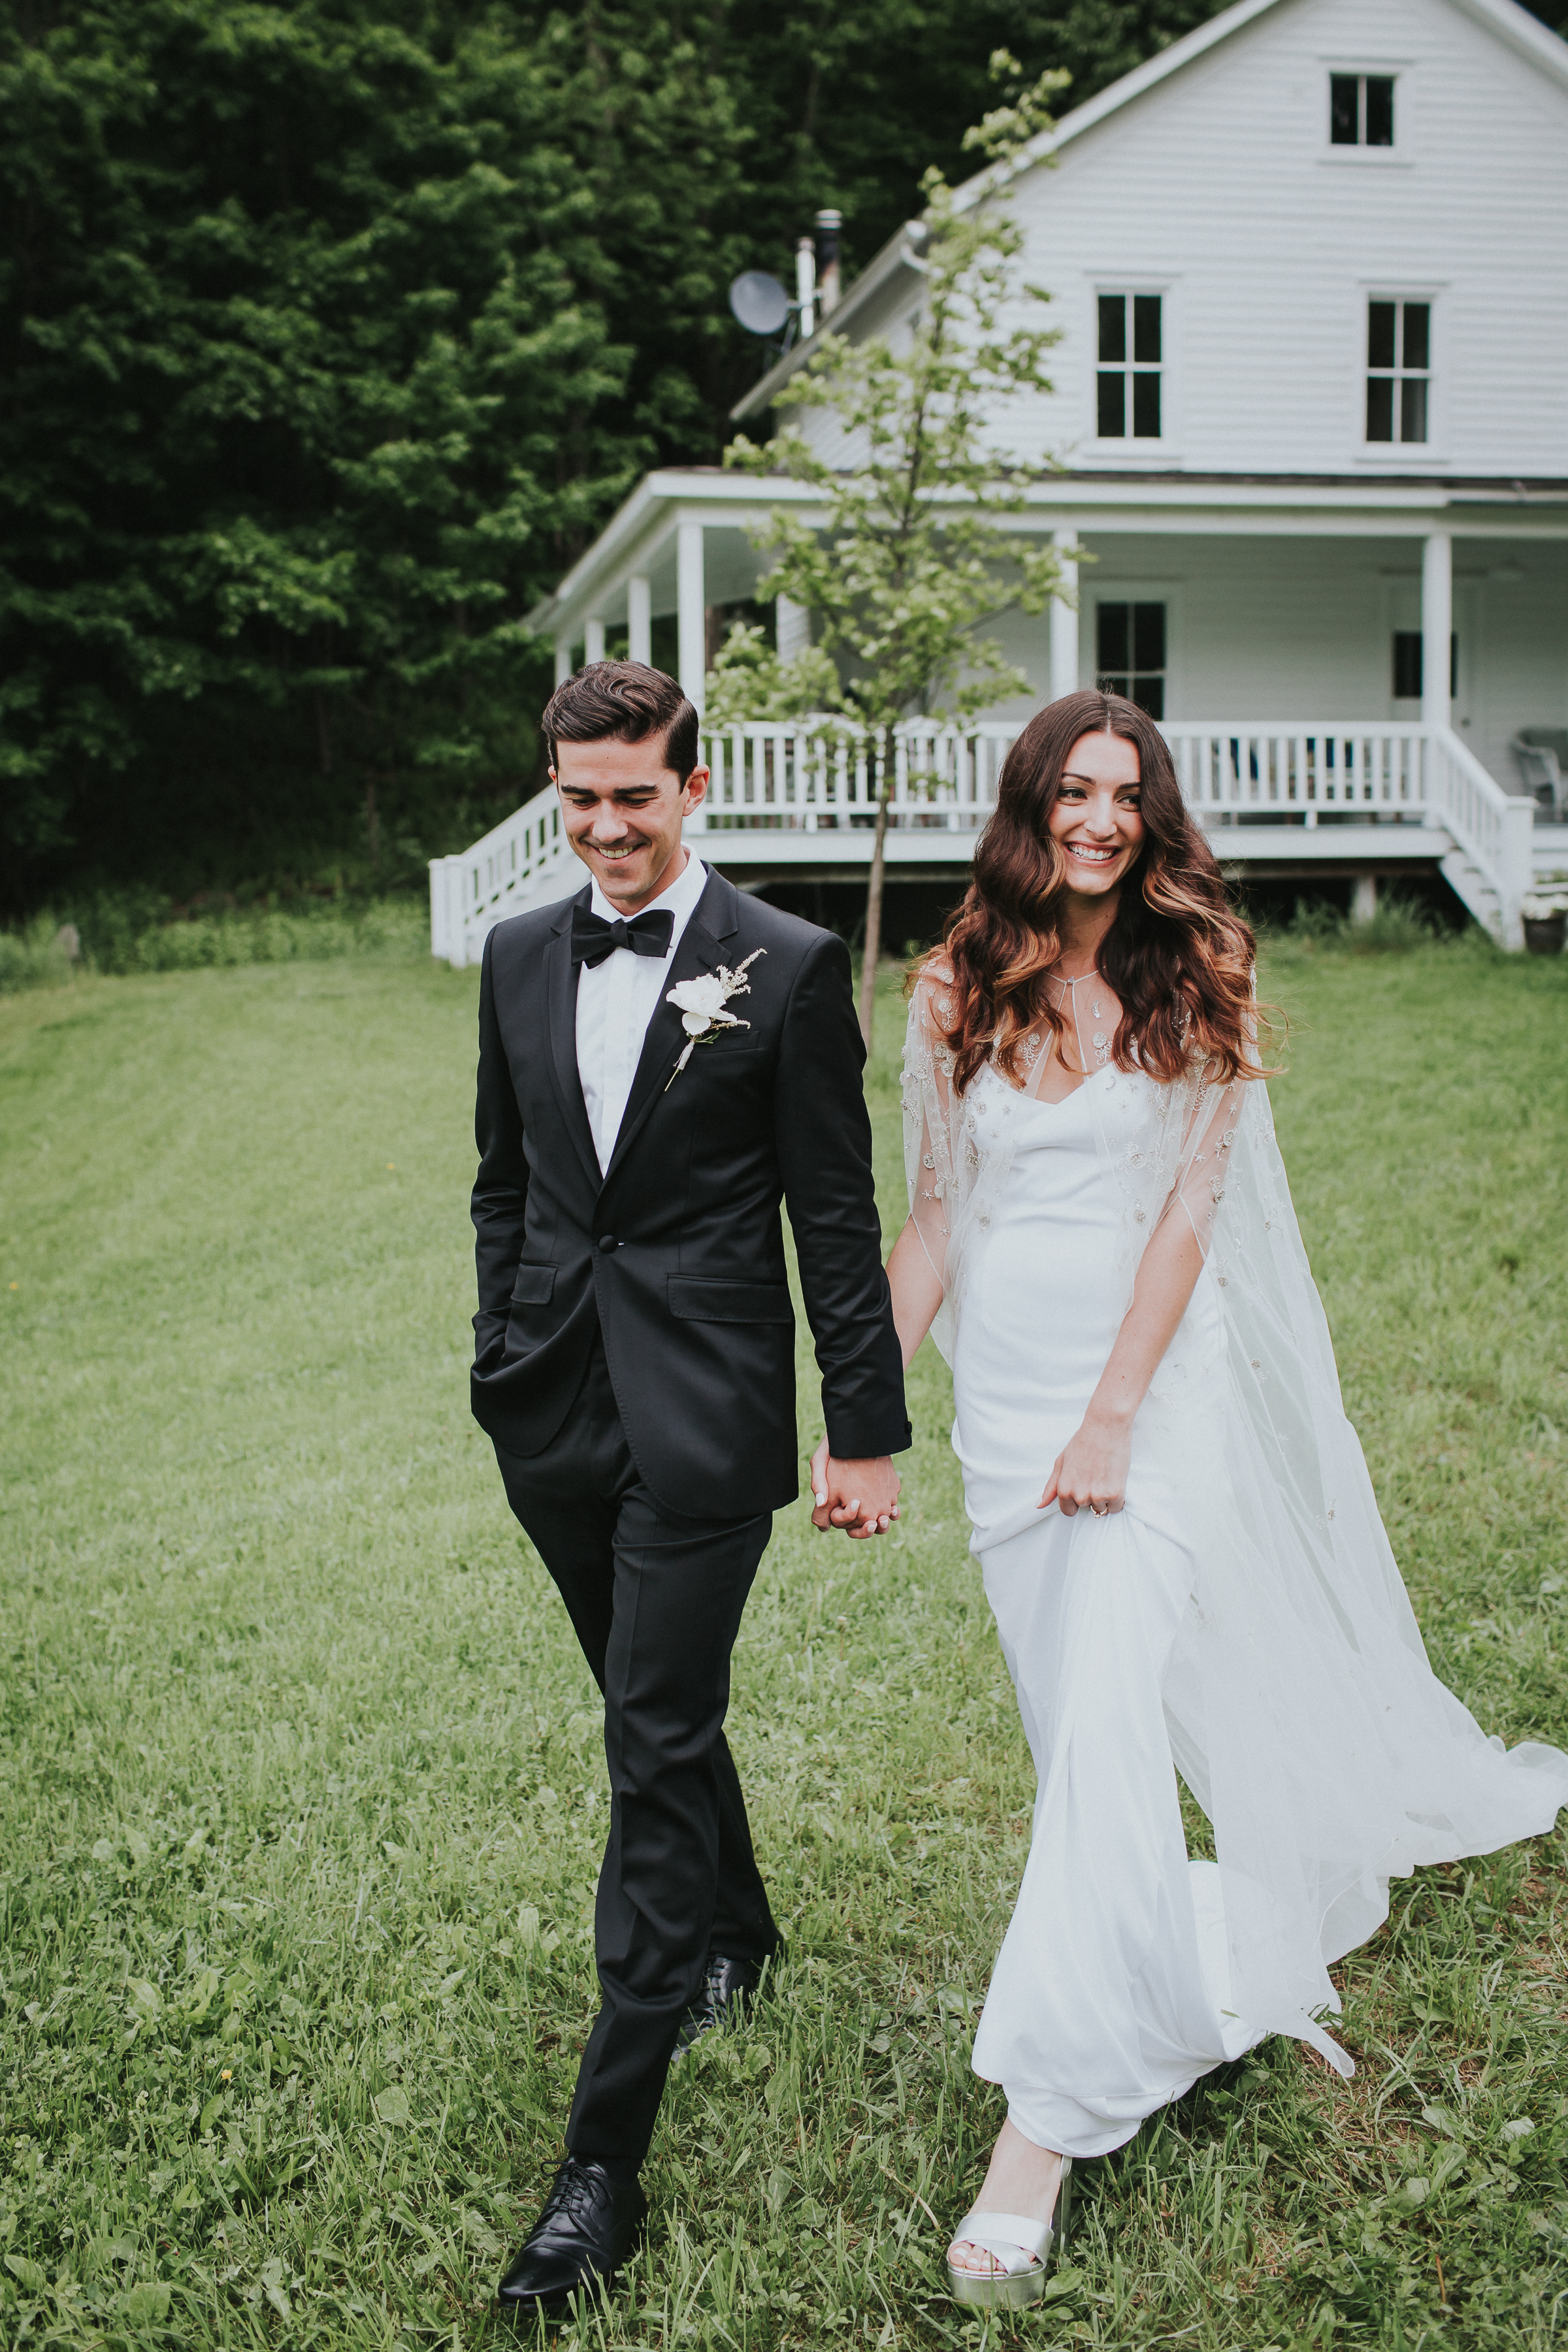 Handsome-Hollow-Long-Eddy-Catskills-New-York-Fine-Art-Documentary-Wedding-Photographer-33.jpg